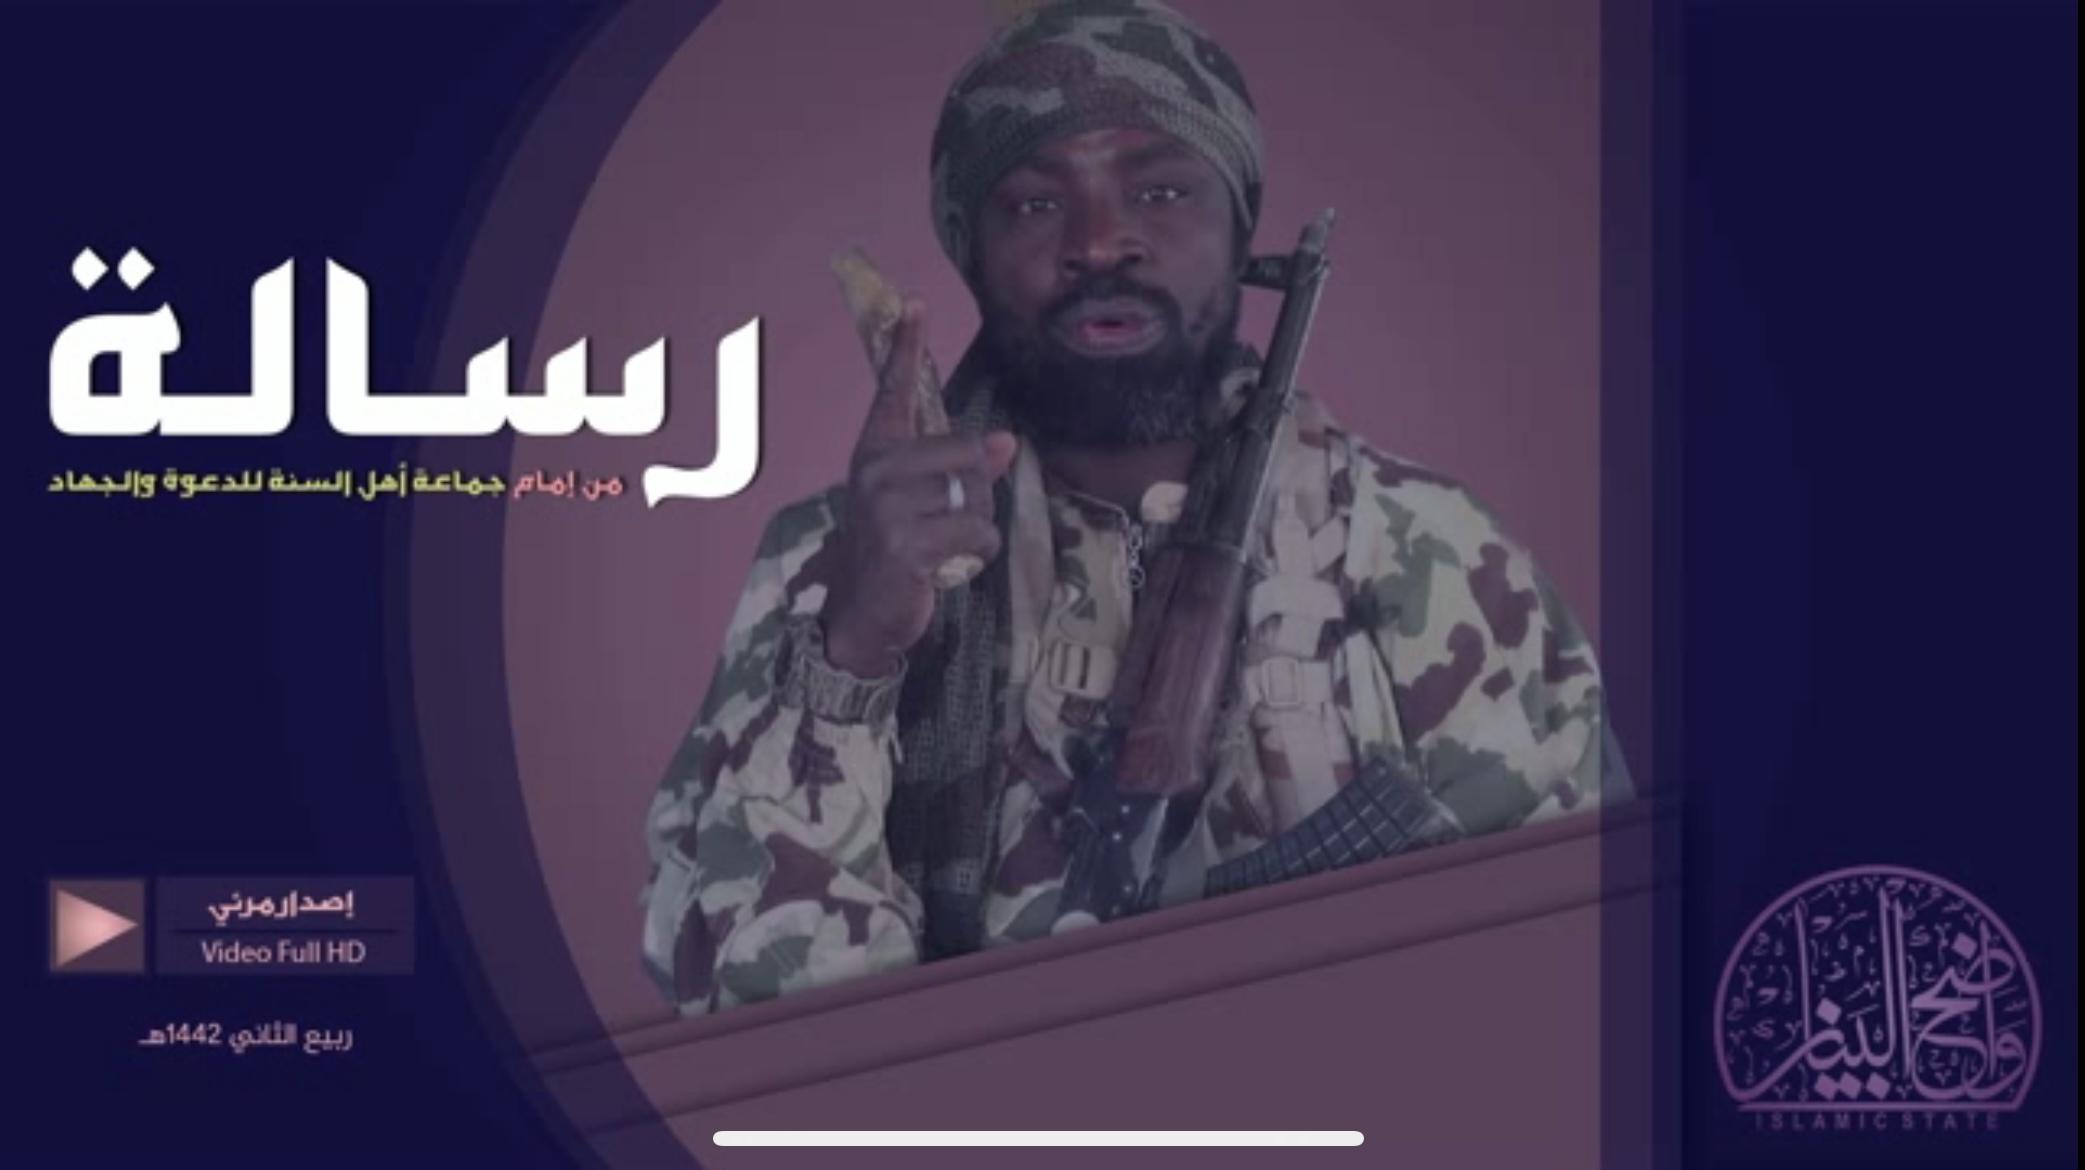 Leader of Boko Haram, Abubakar Shekau